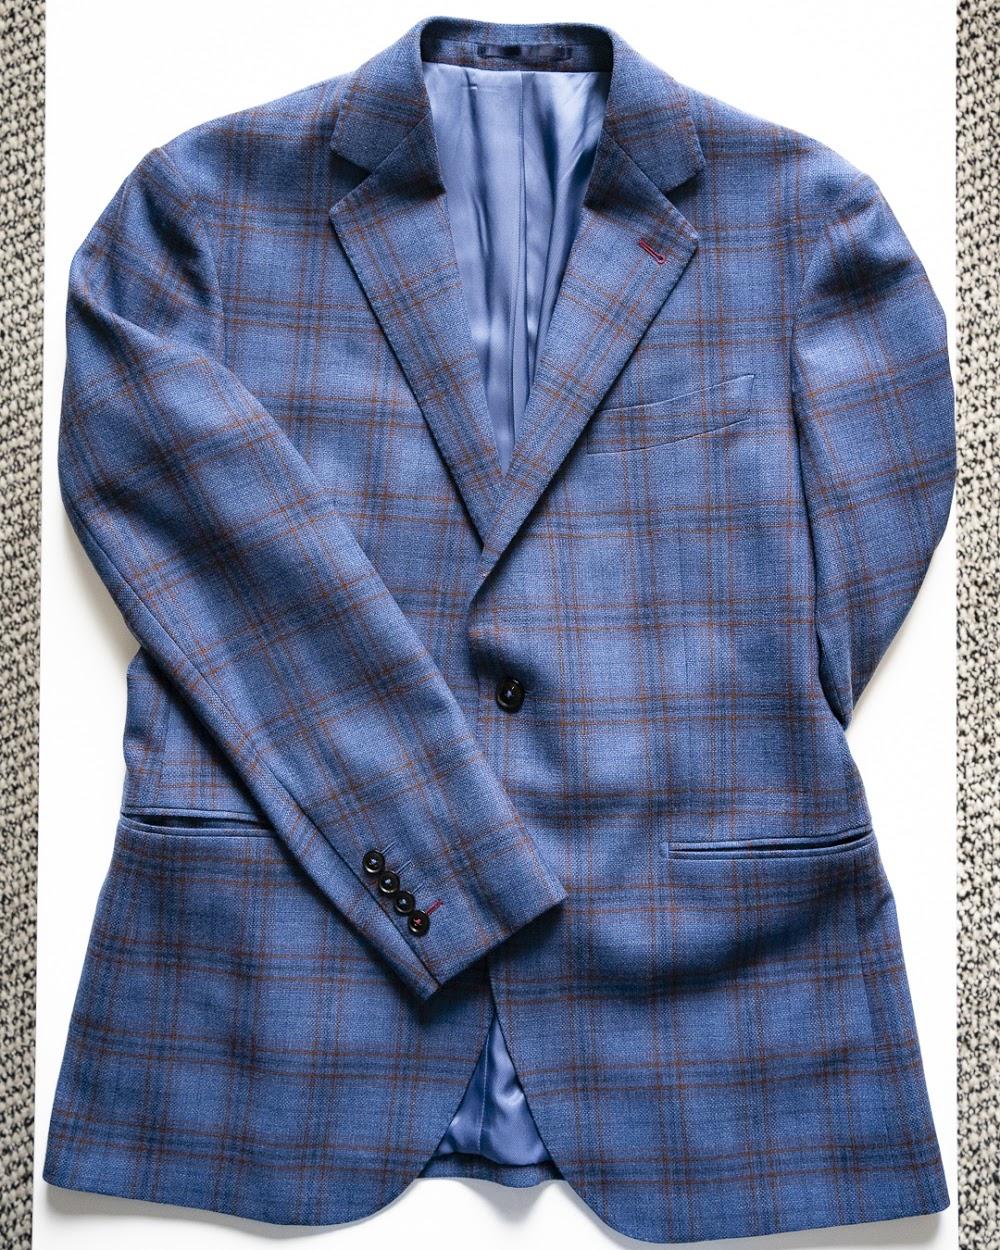 LordsOfWool.com Men's Suits